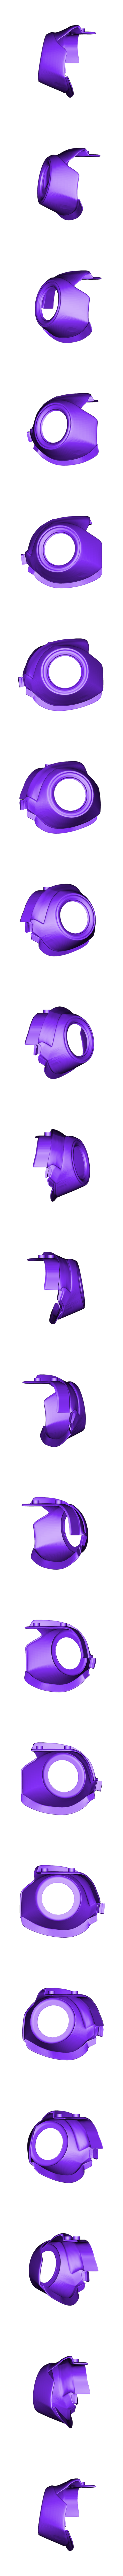 Lucio_speakerMnt_rgt.stl Download free STL file Overwatch Lucio Blaster • 3D printer object, Adafruit